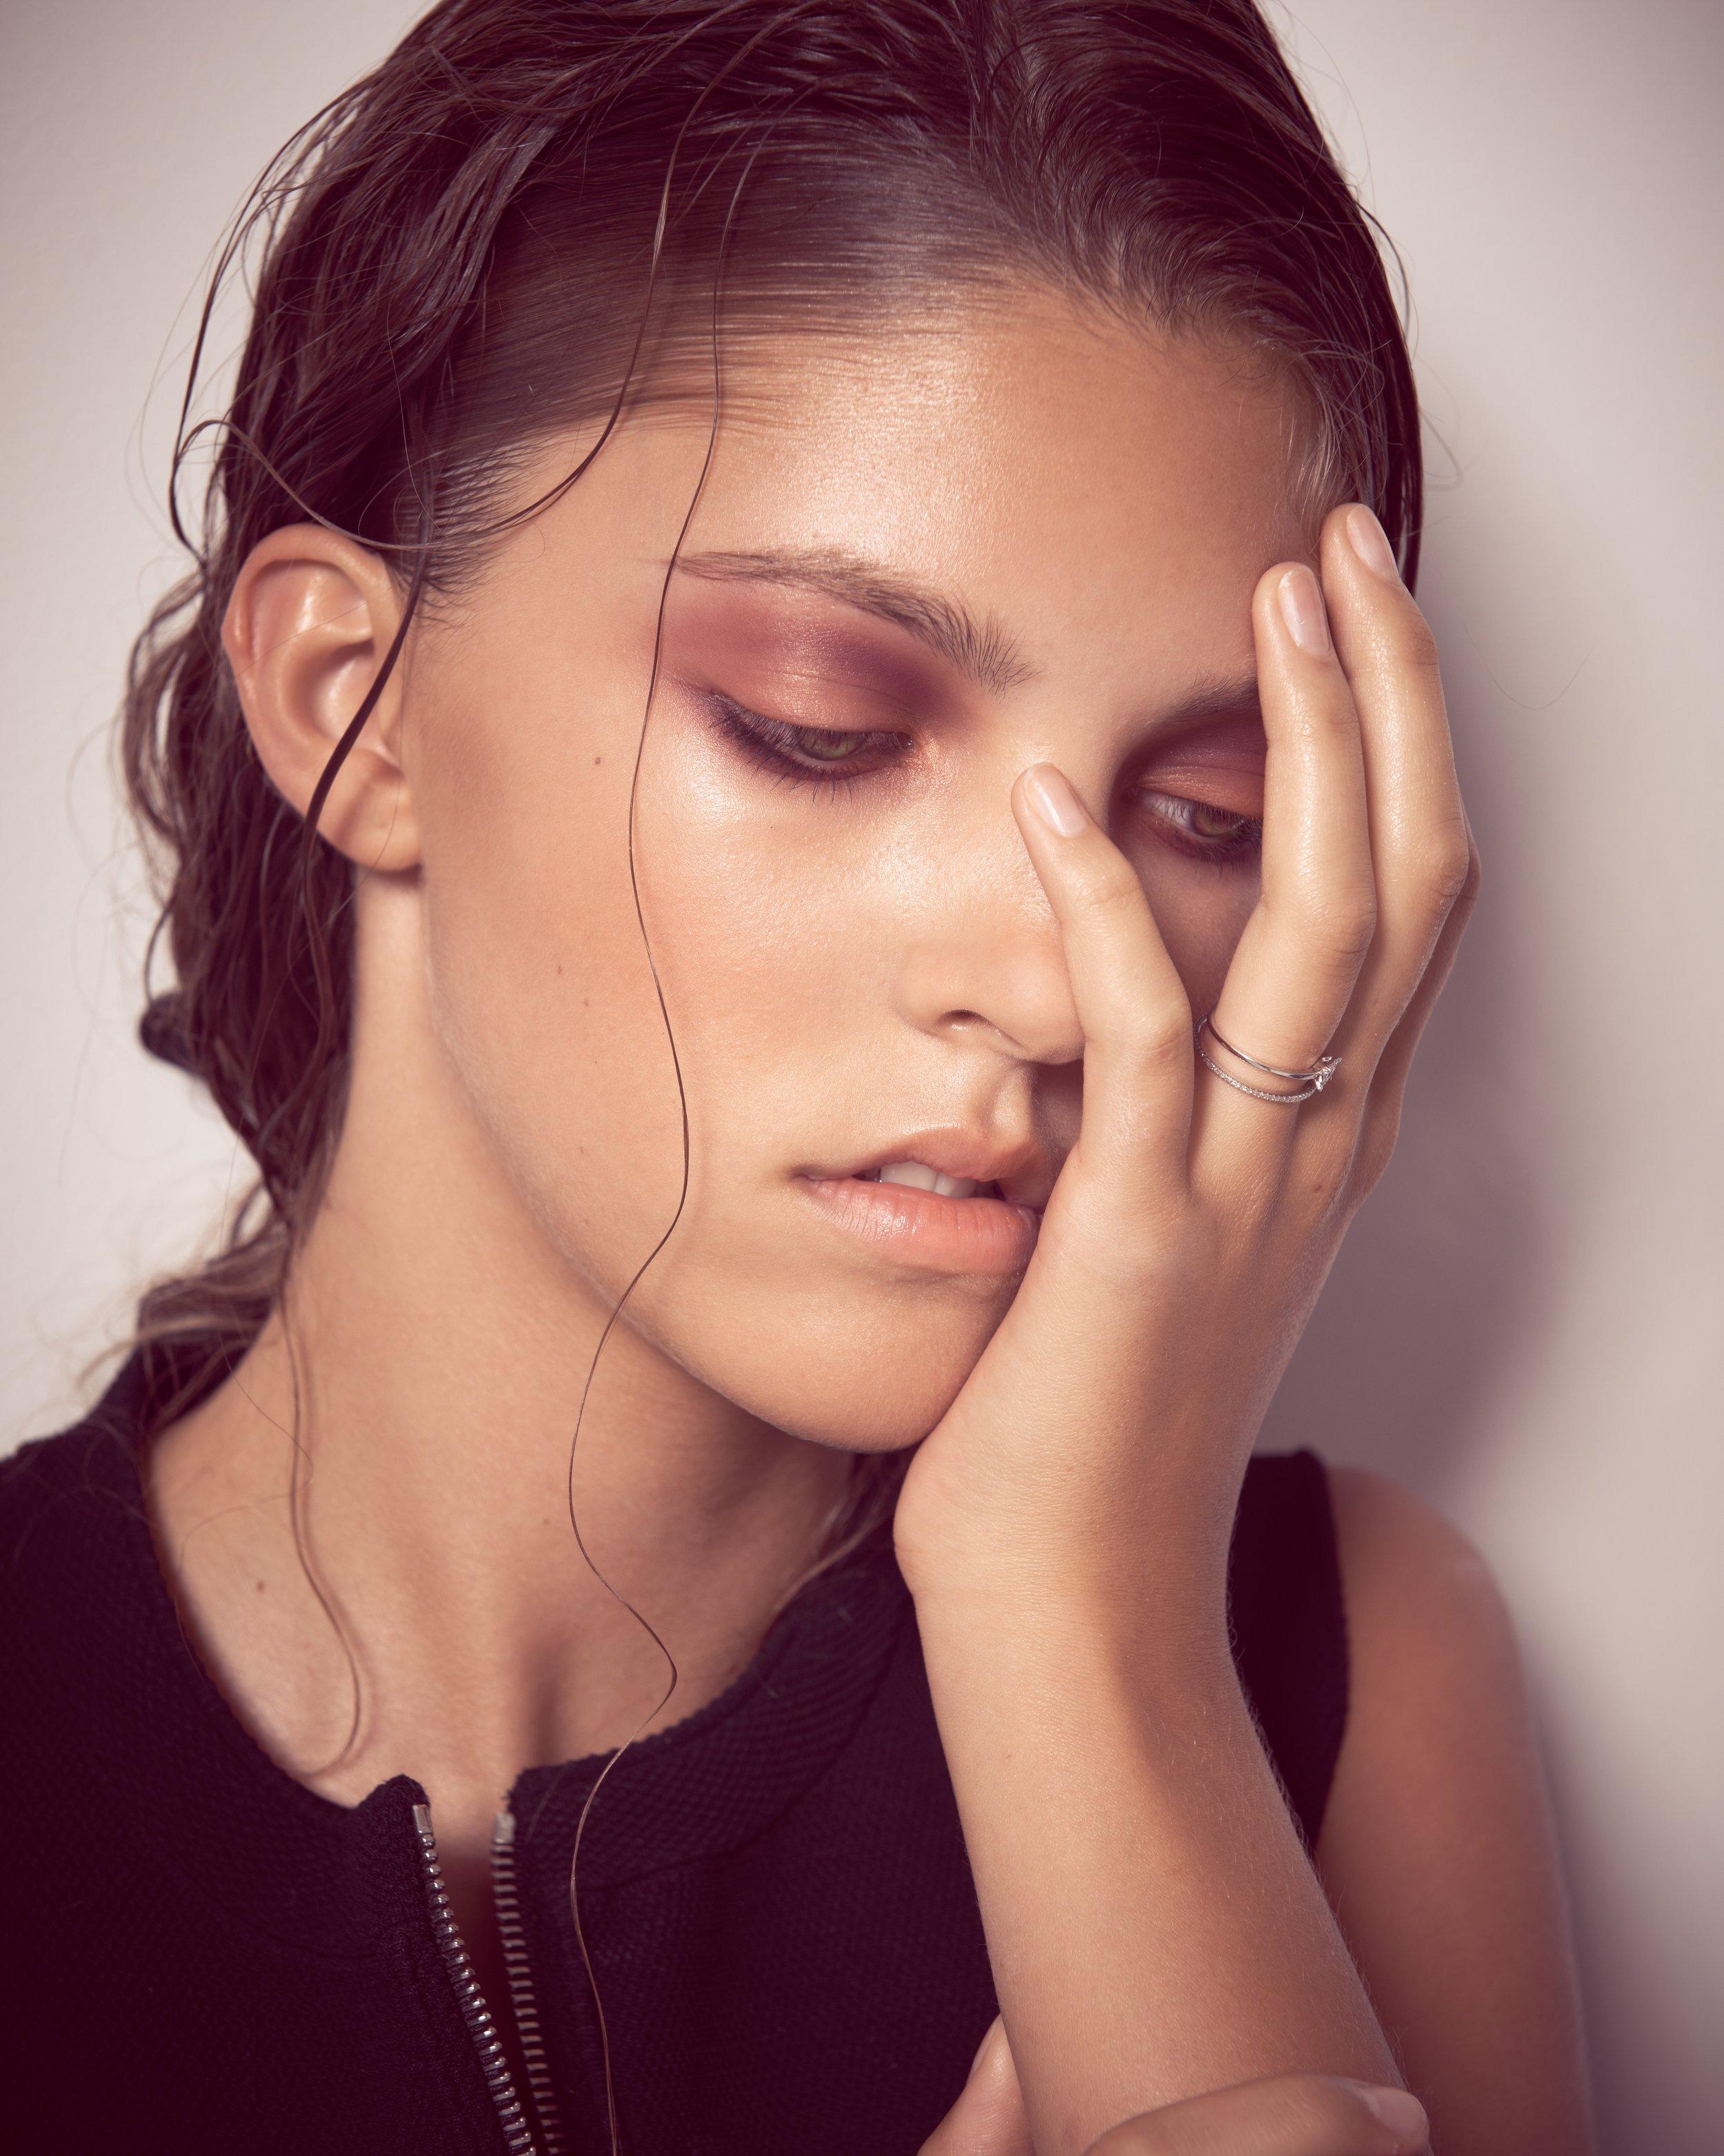 Andreas Ortner Milkcitystudio  Luna Elisa Federowicz Visagistin Hair- and Make up Artist